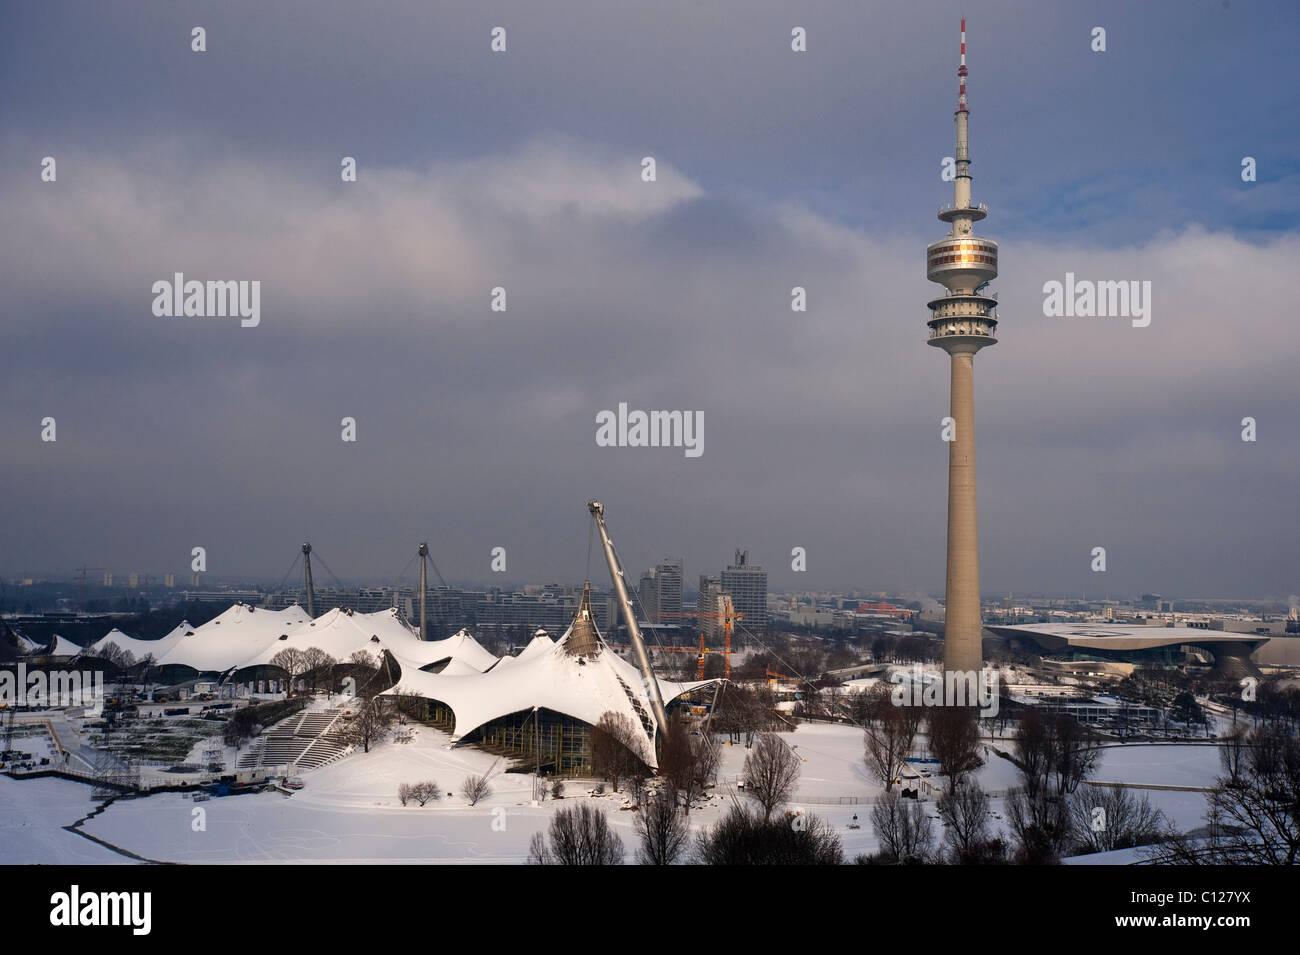 Olympic Tower and Olympic Stadium, Olympic Park, Munich, Bavaria, Germany, Europe - Stock Image